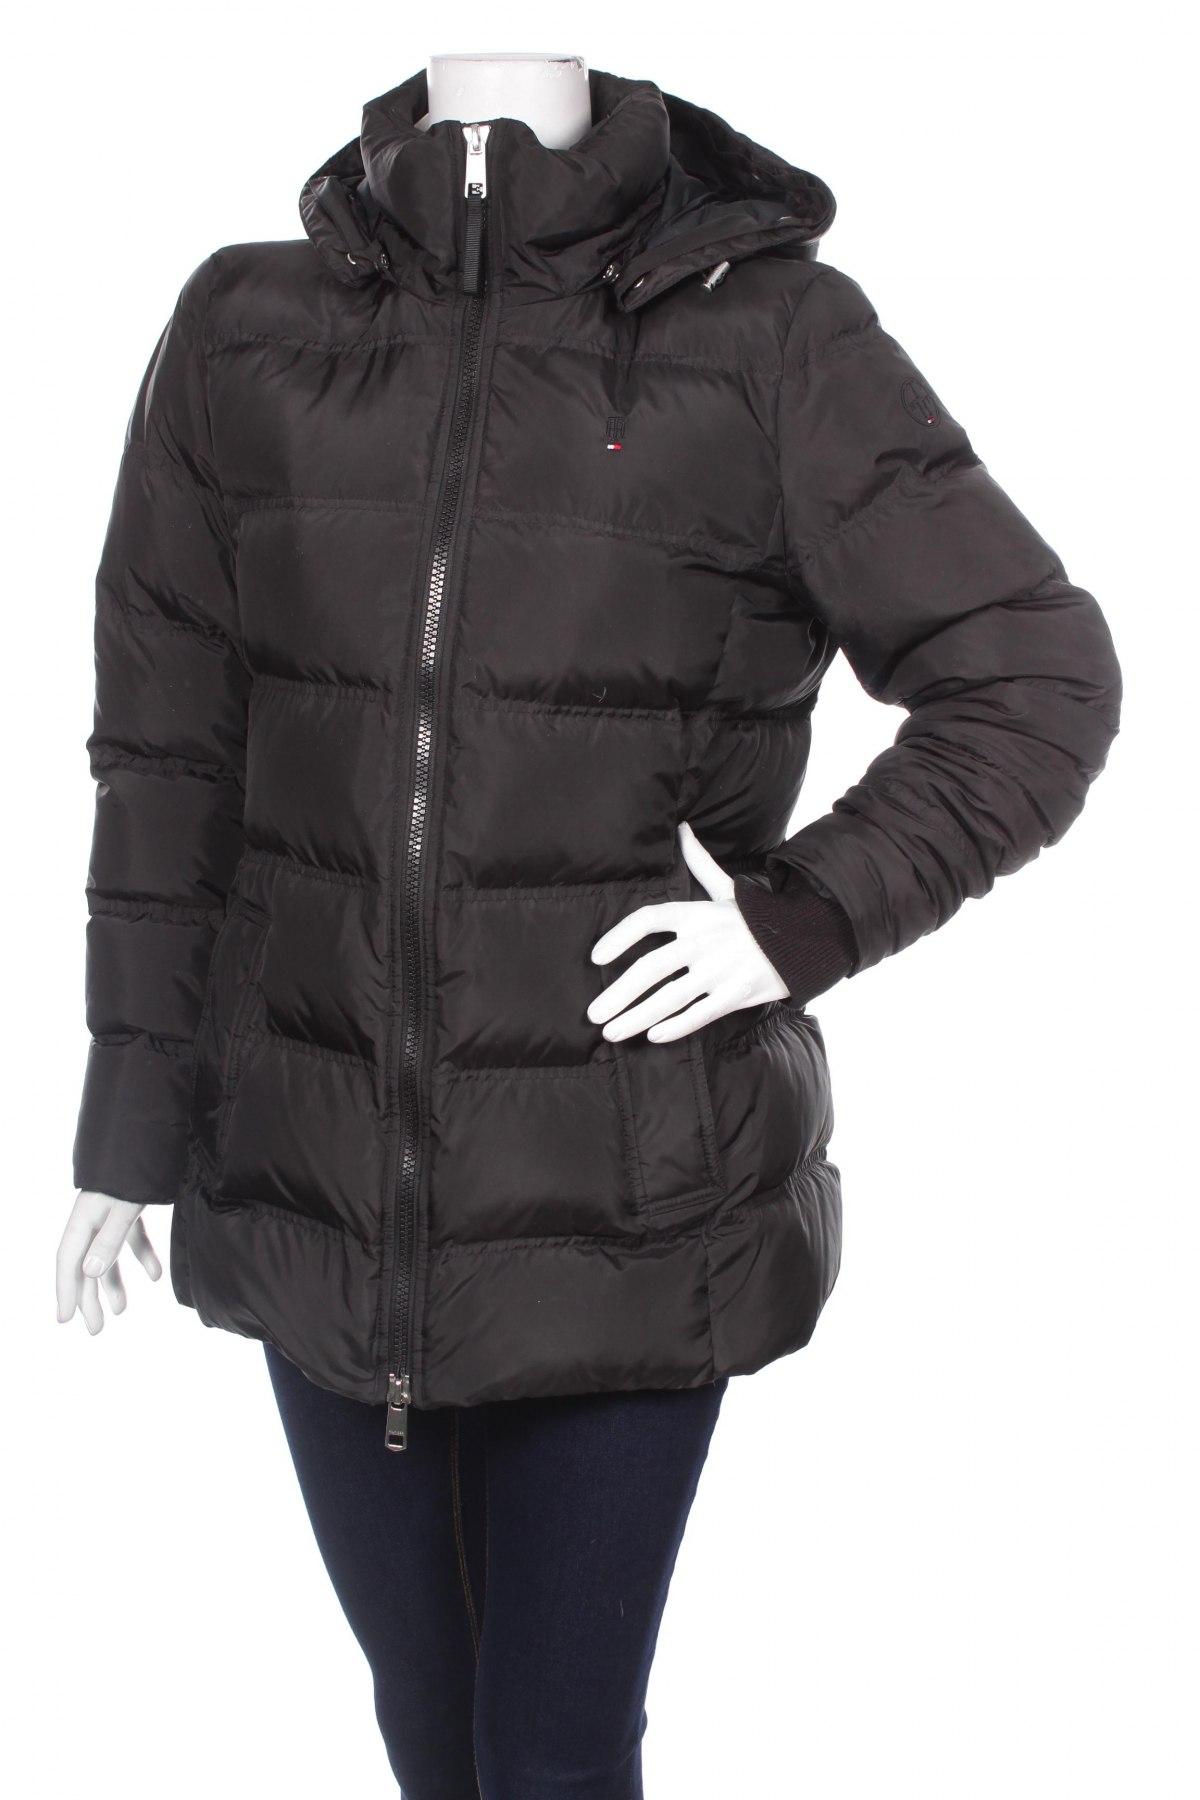 Women's jacket Tommy Hilfiger #8195533